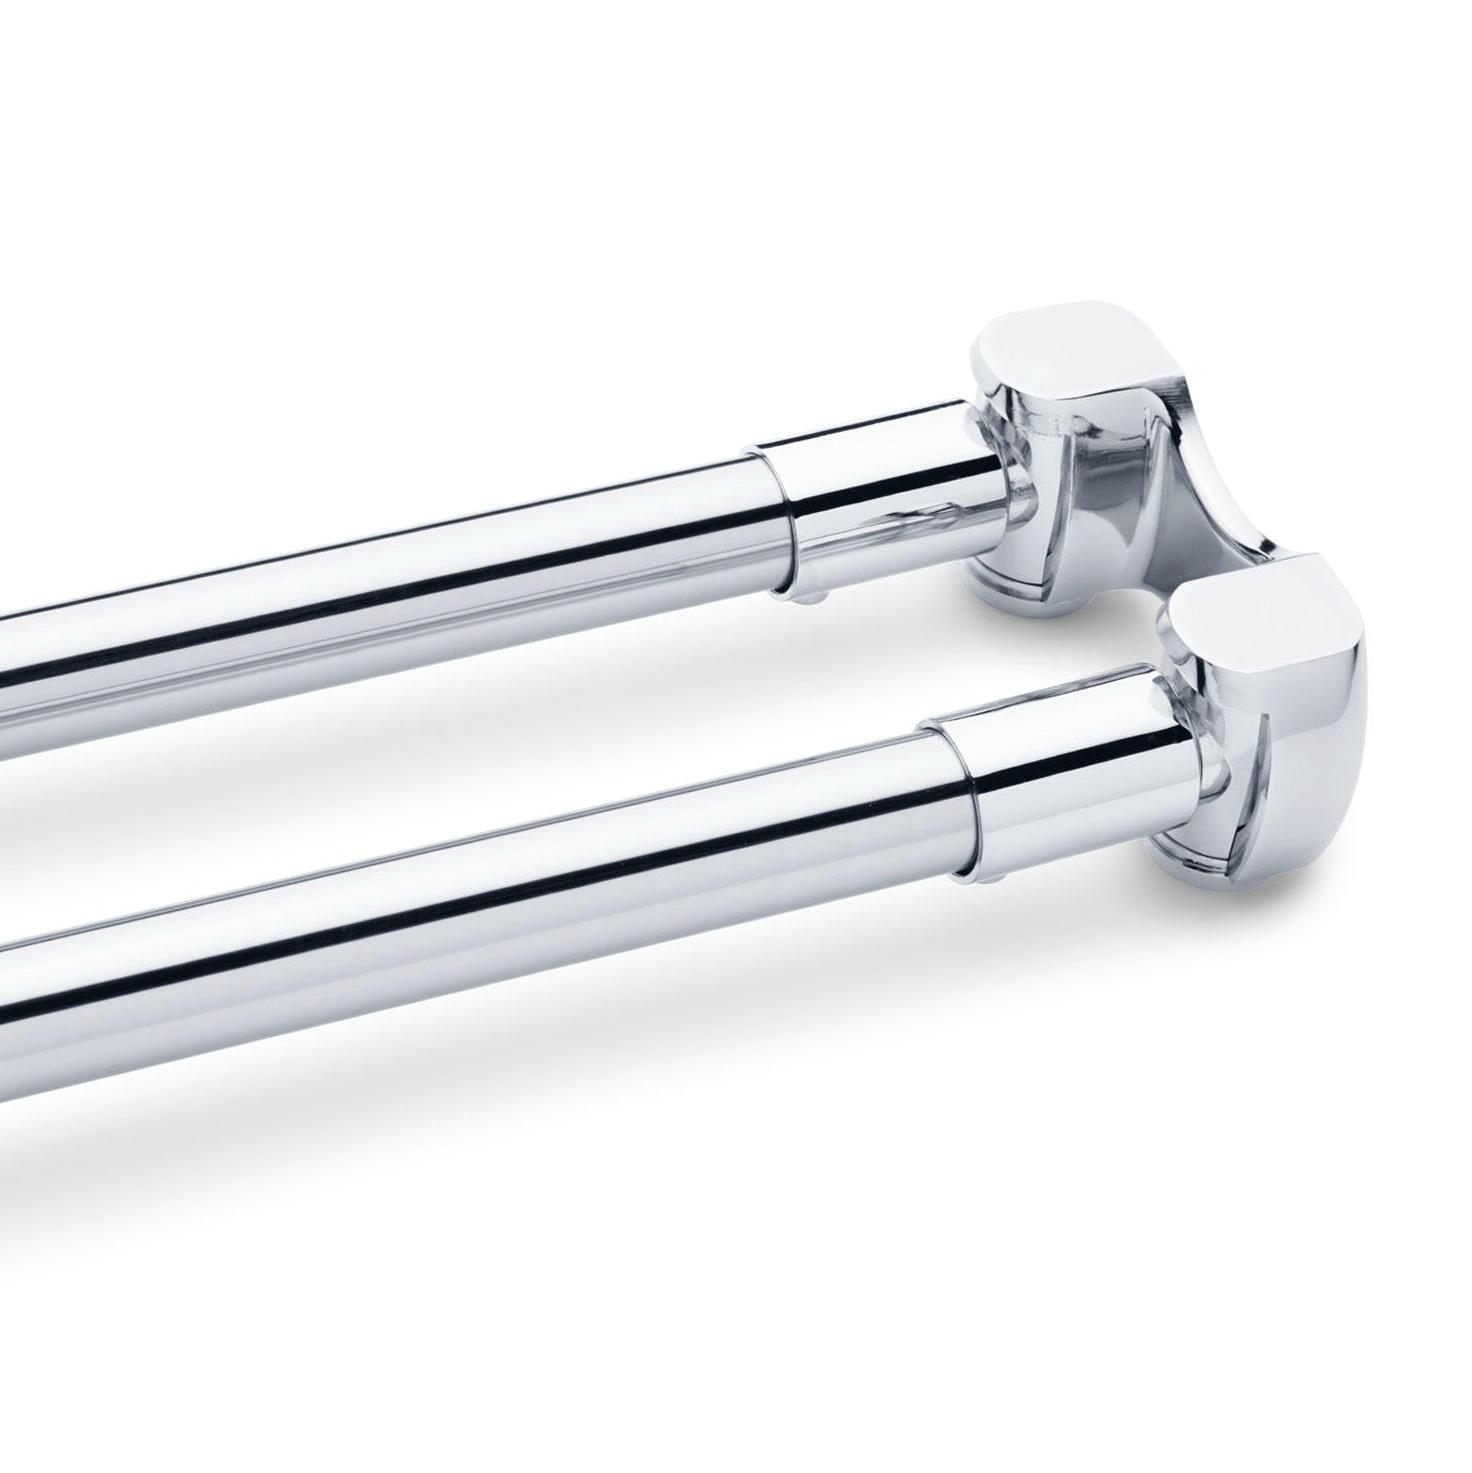 Shower Curtain Tension Rod Chrome Home Design Ideas